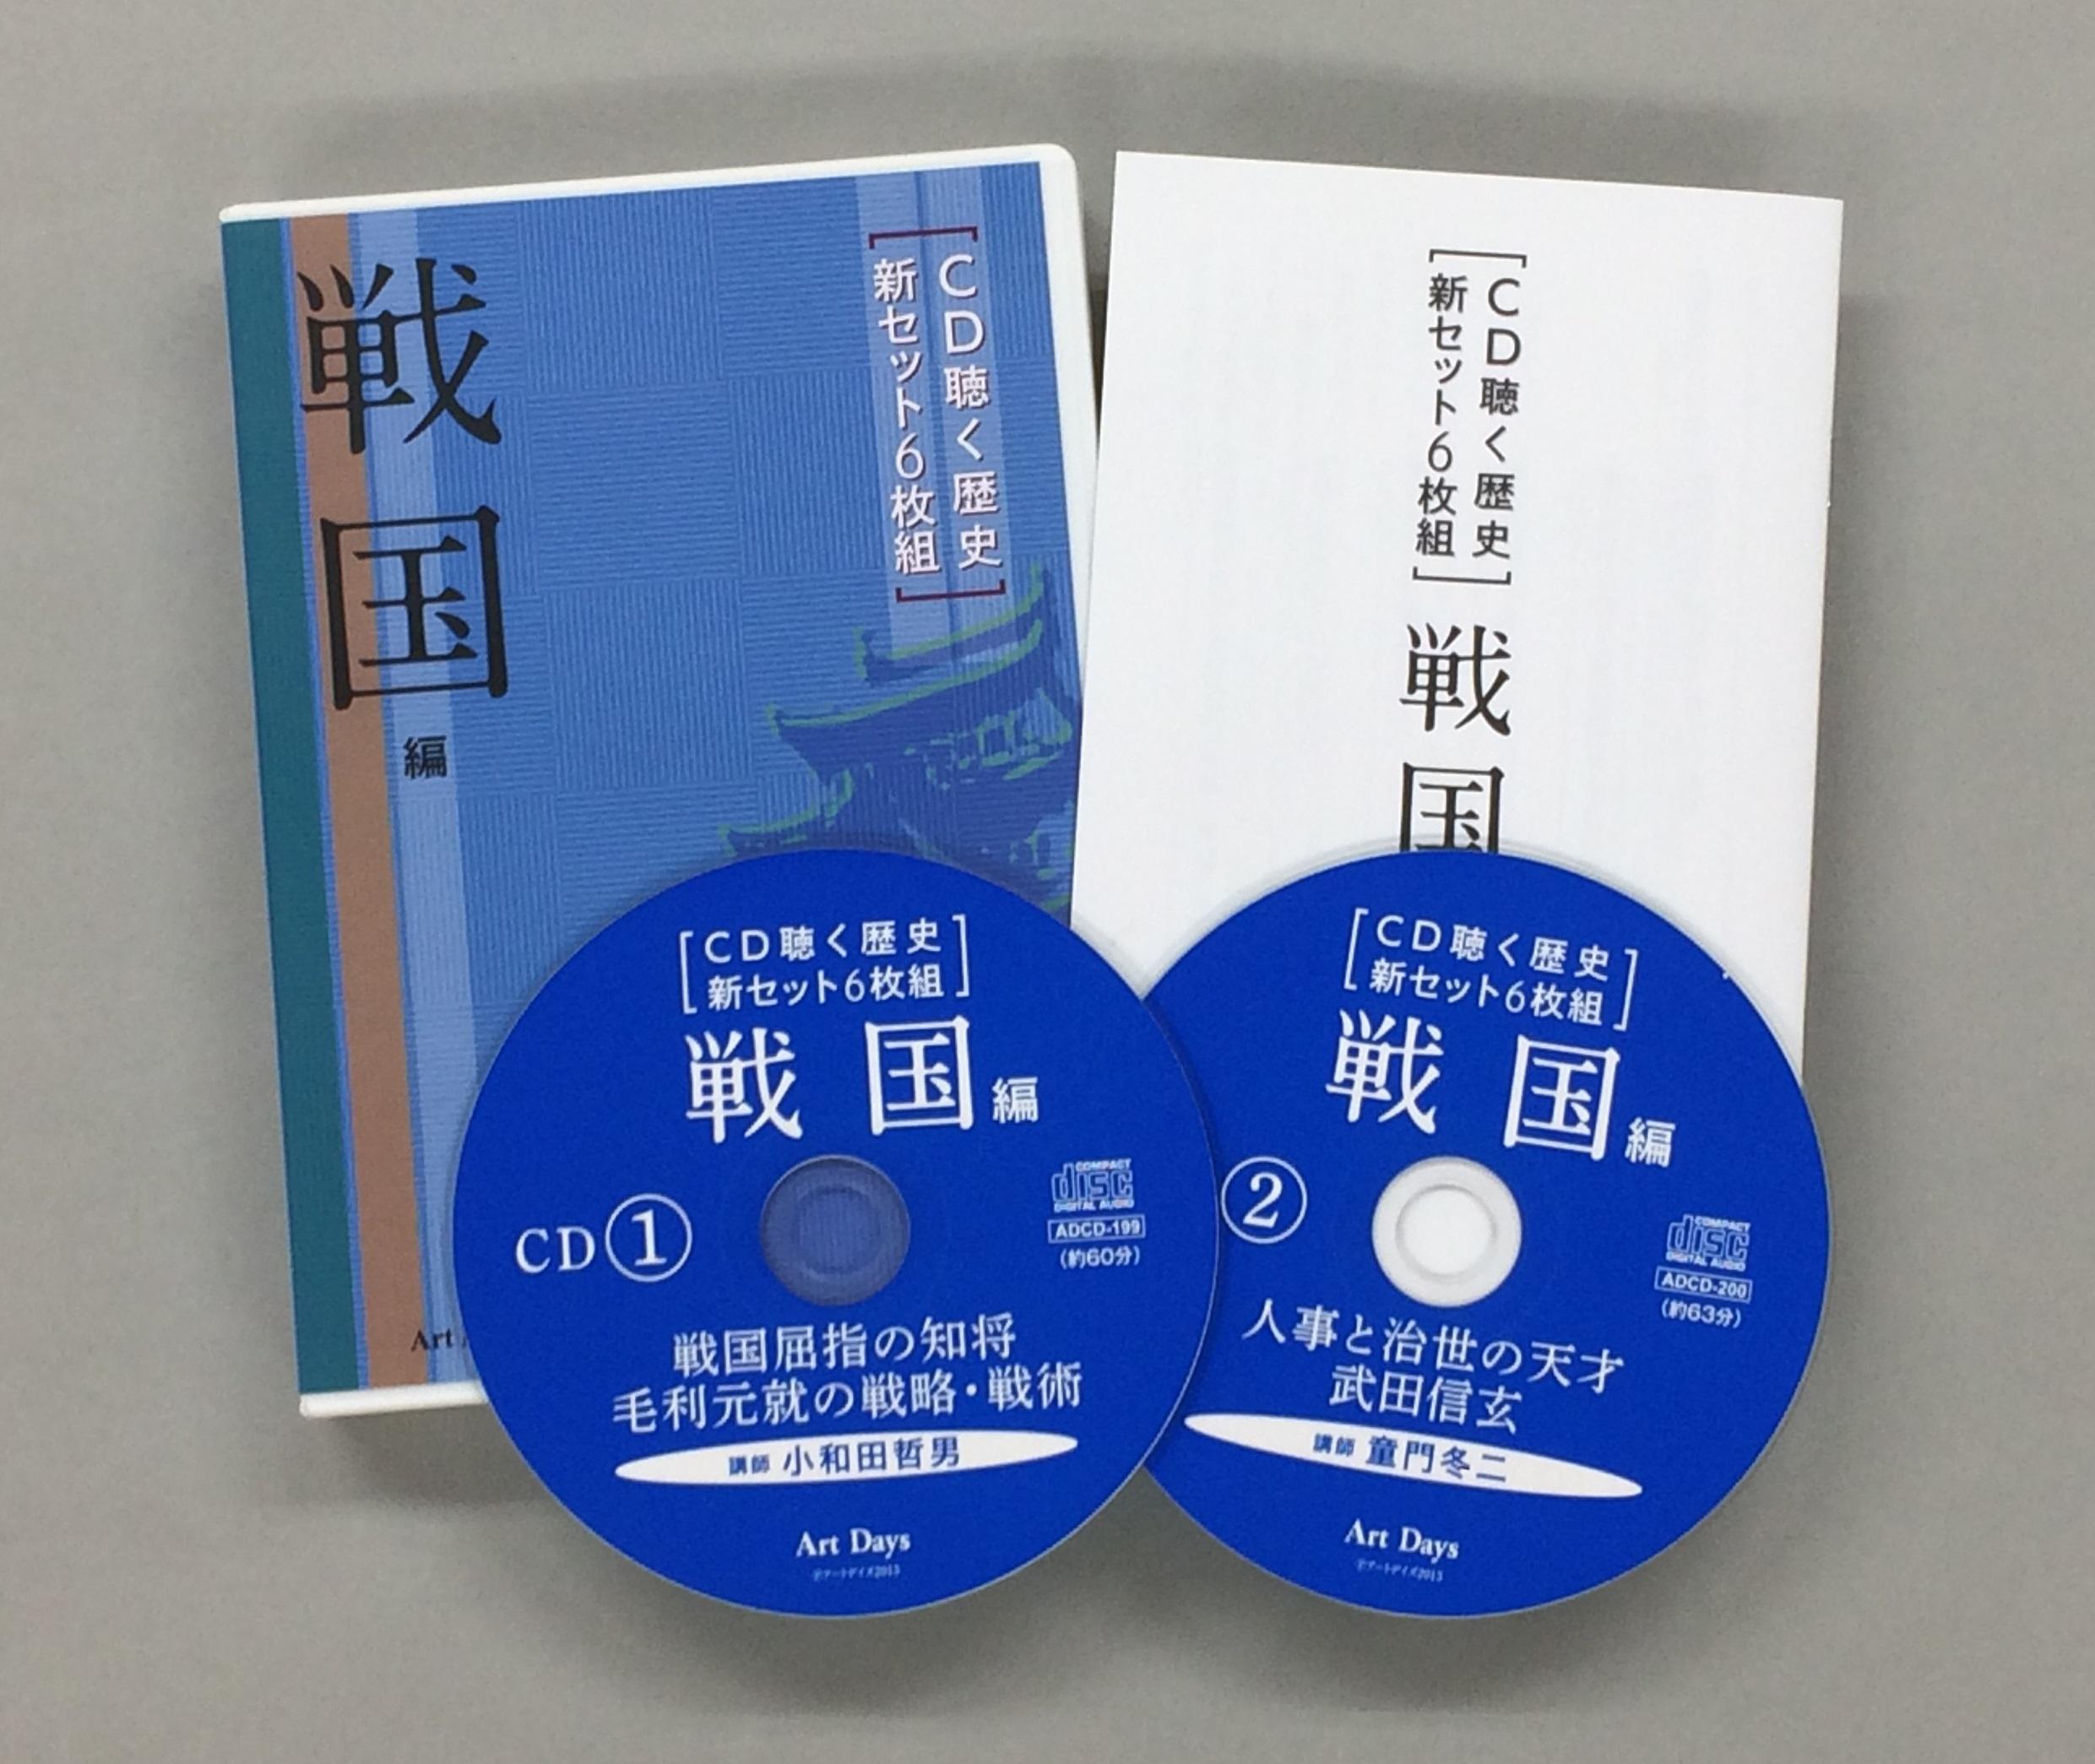 CD聴く歴史 新セット6枚組 戦国編